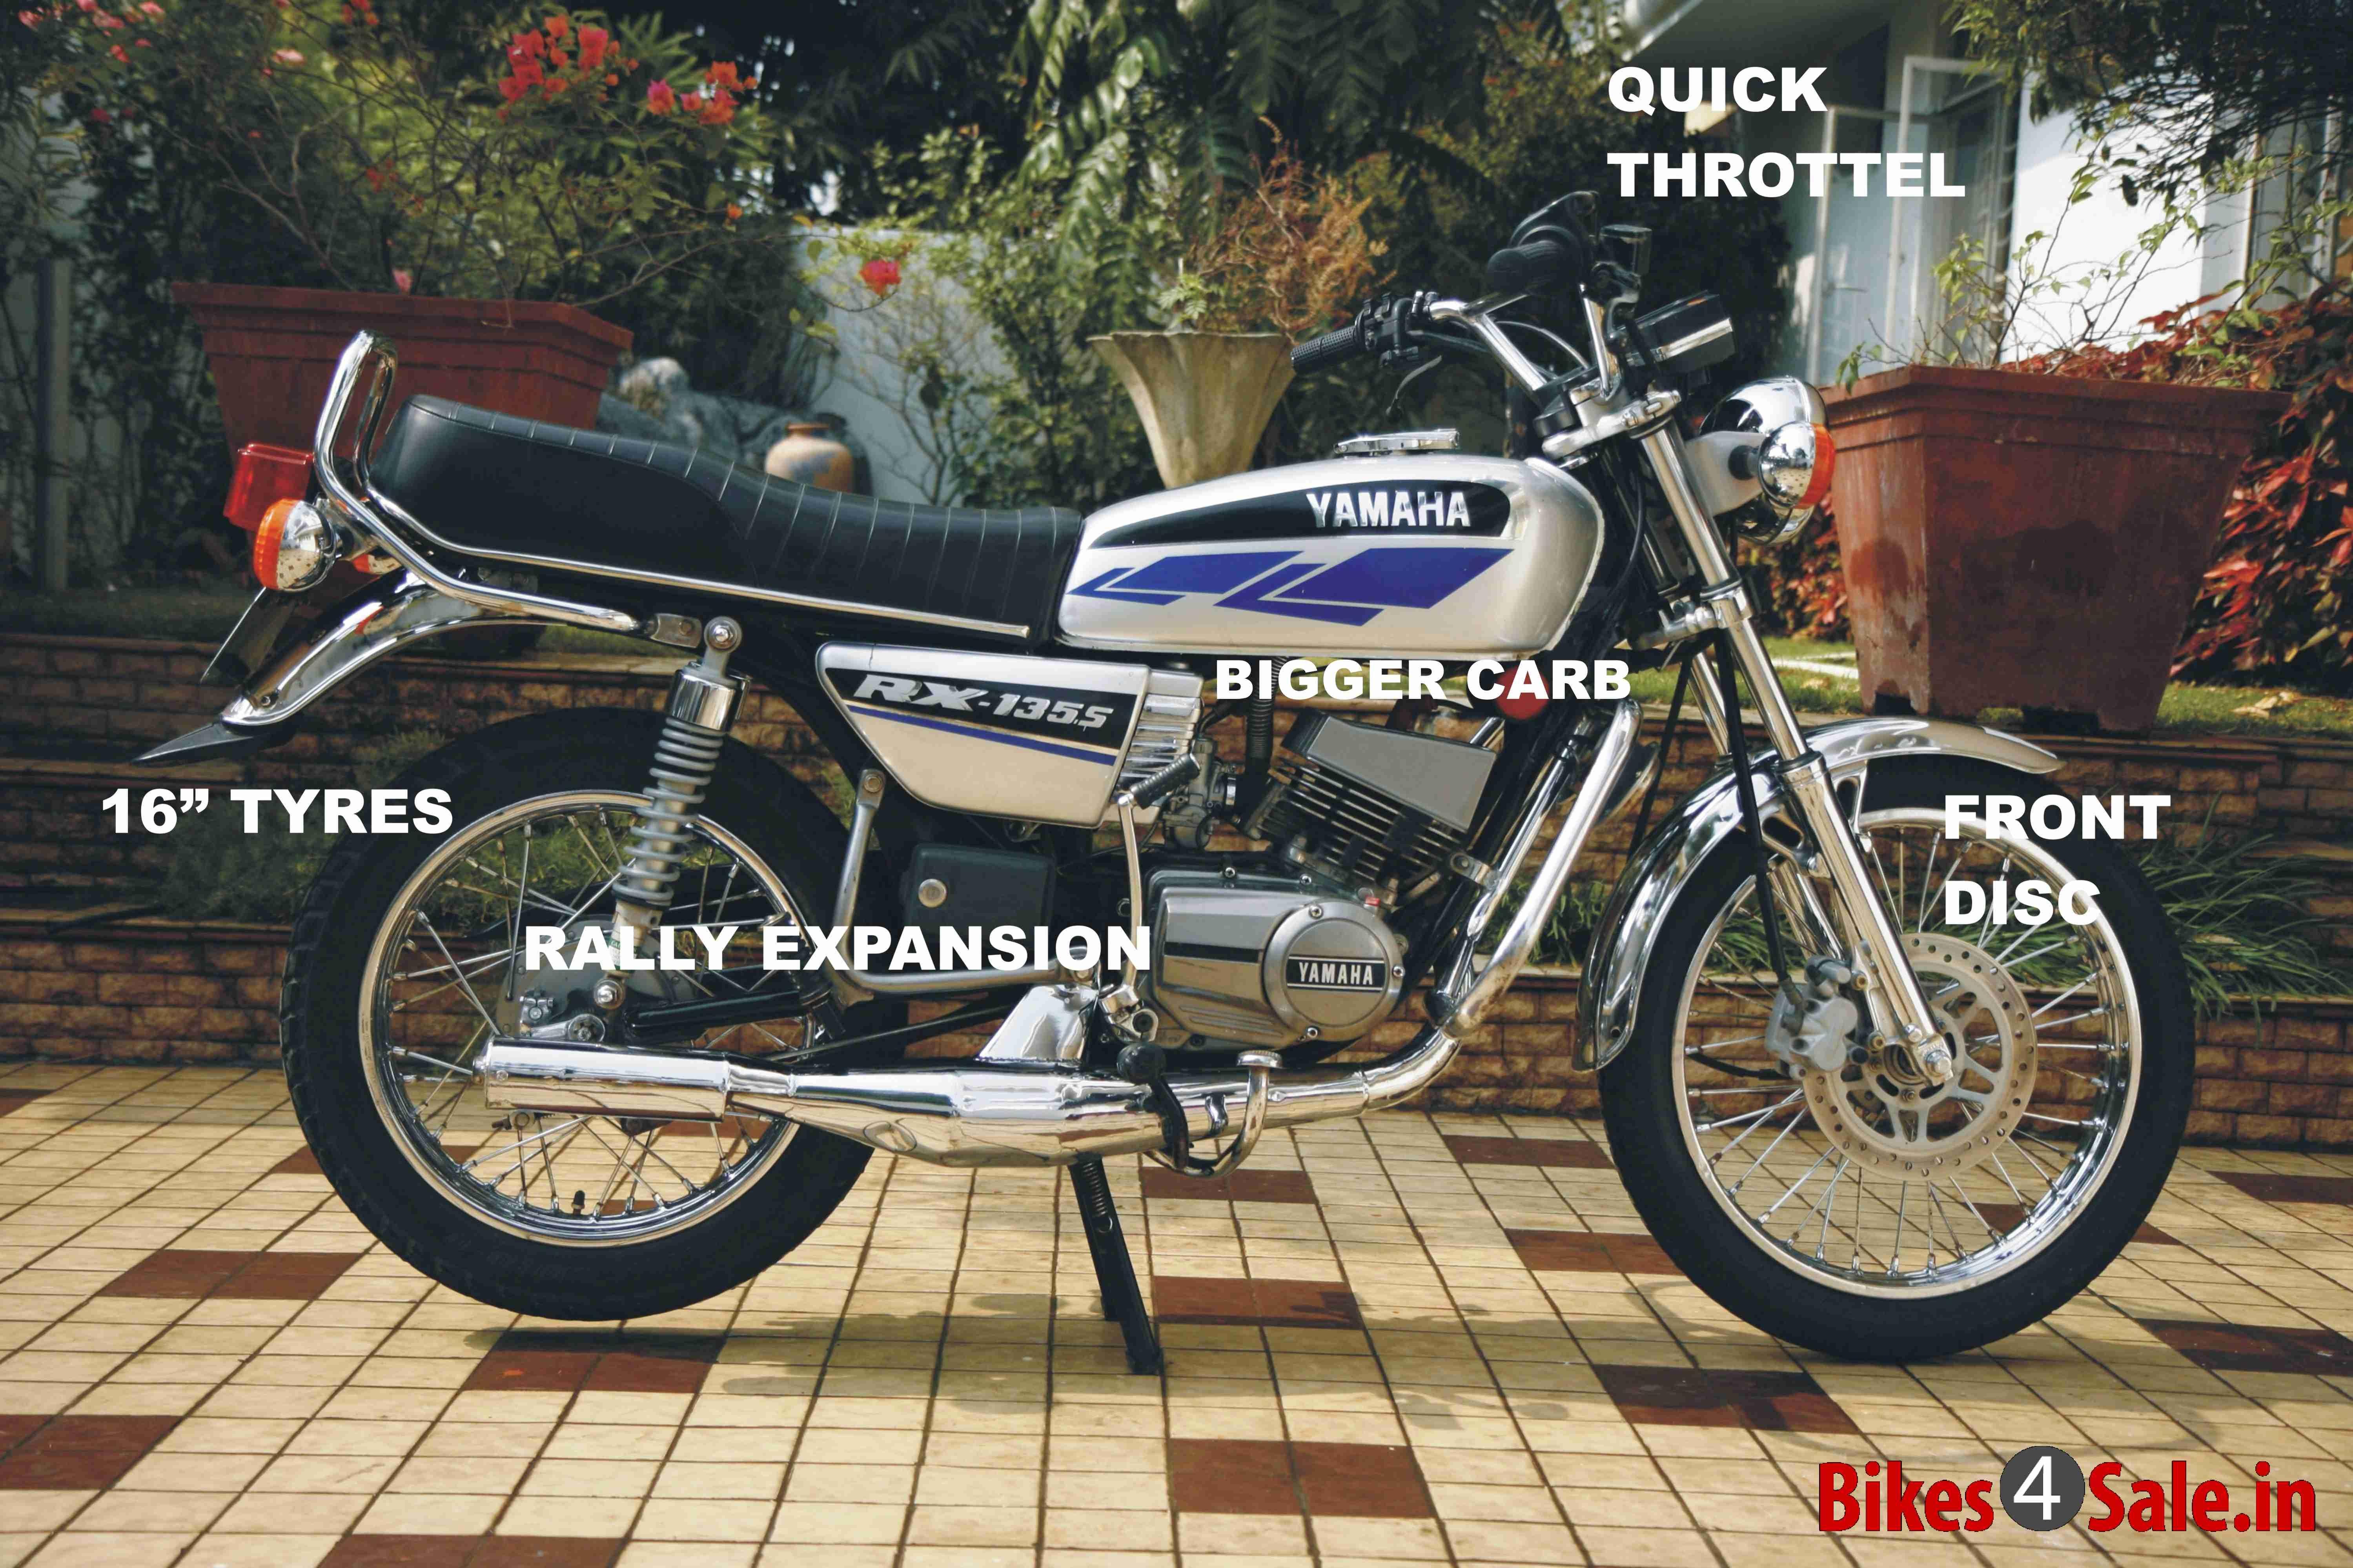 Yamaha Rx135 Motorcycle Yamaha Rx 135 Yamaha Bike Tank